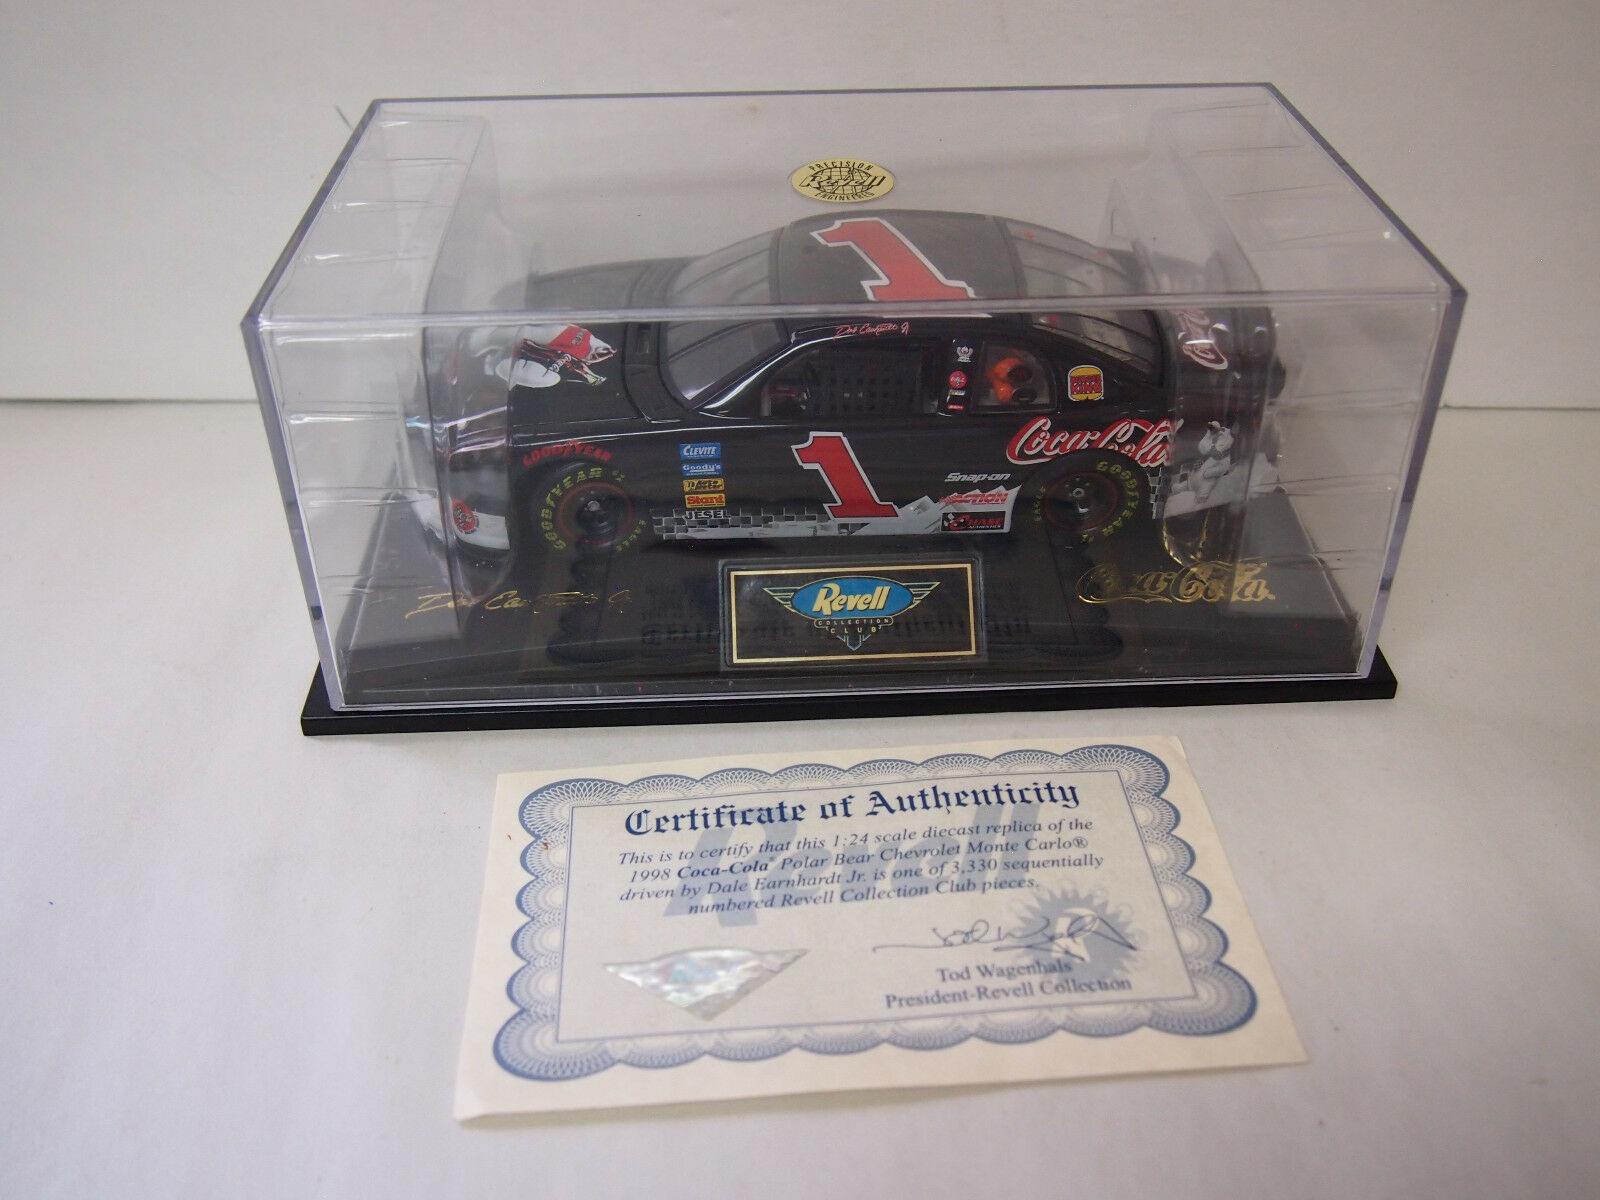 1998 Dale Earnhardt Jr. Revell 1 24 Coca Cola Monte Carlo  COLLECTION CLUB